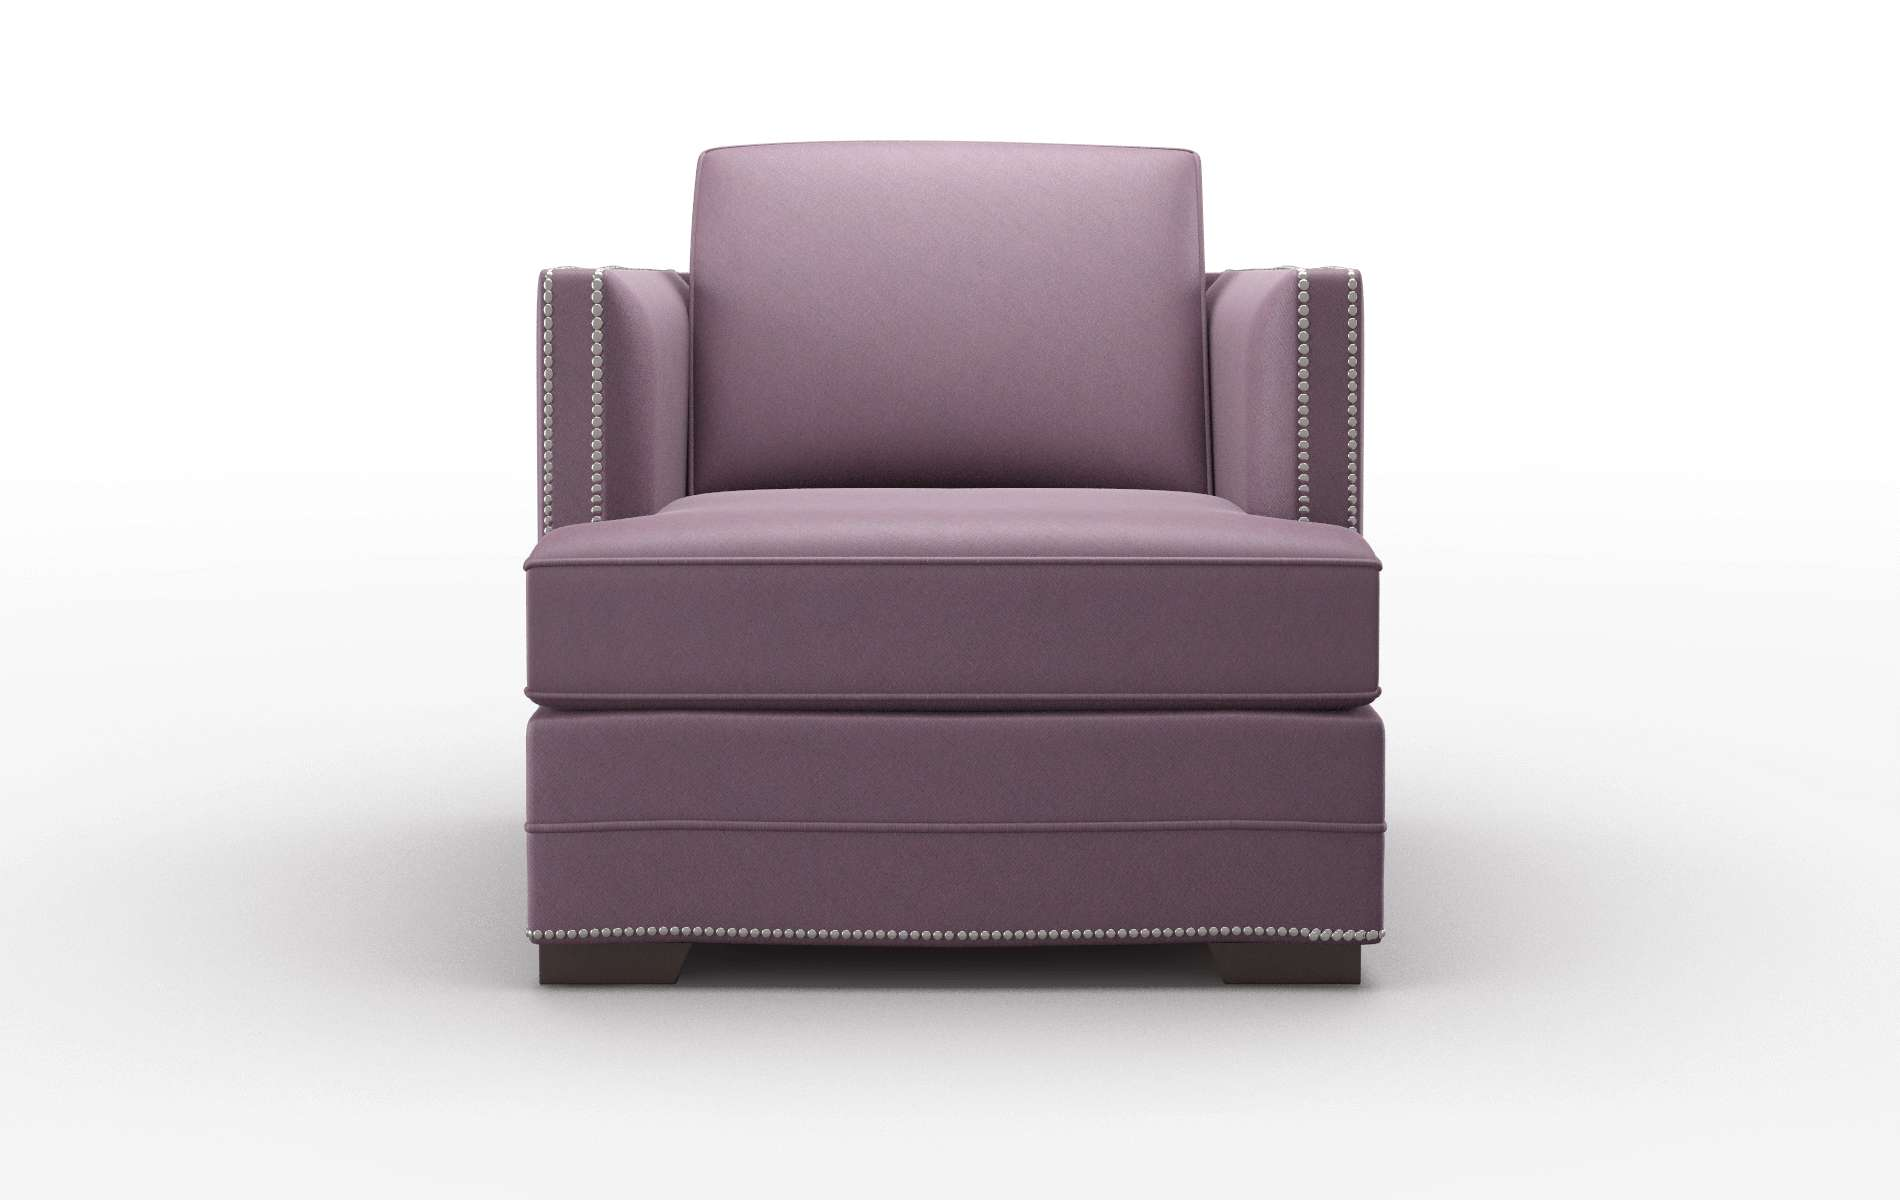 Riga Bella Aubergine Chair espresso legs 1